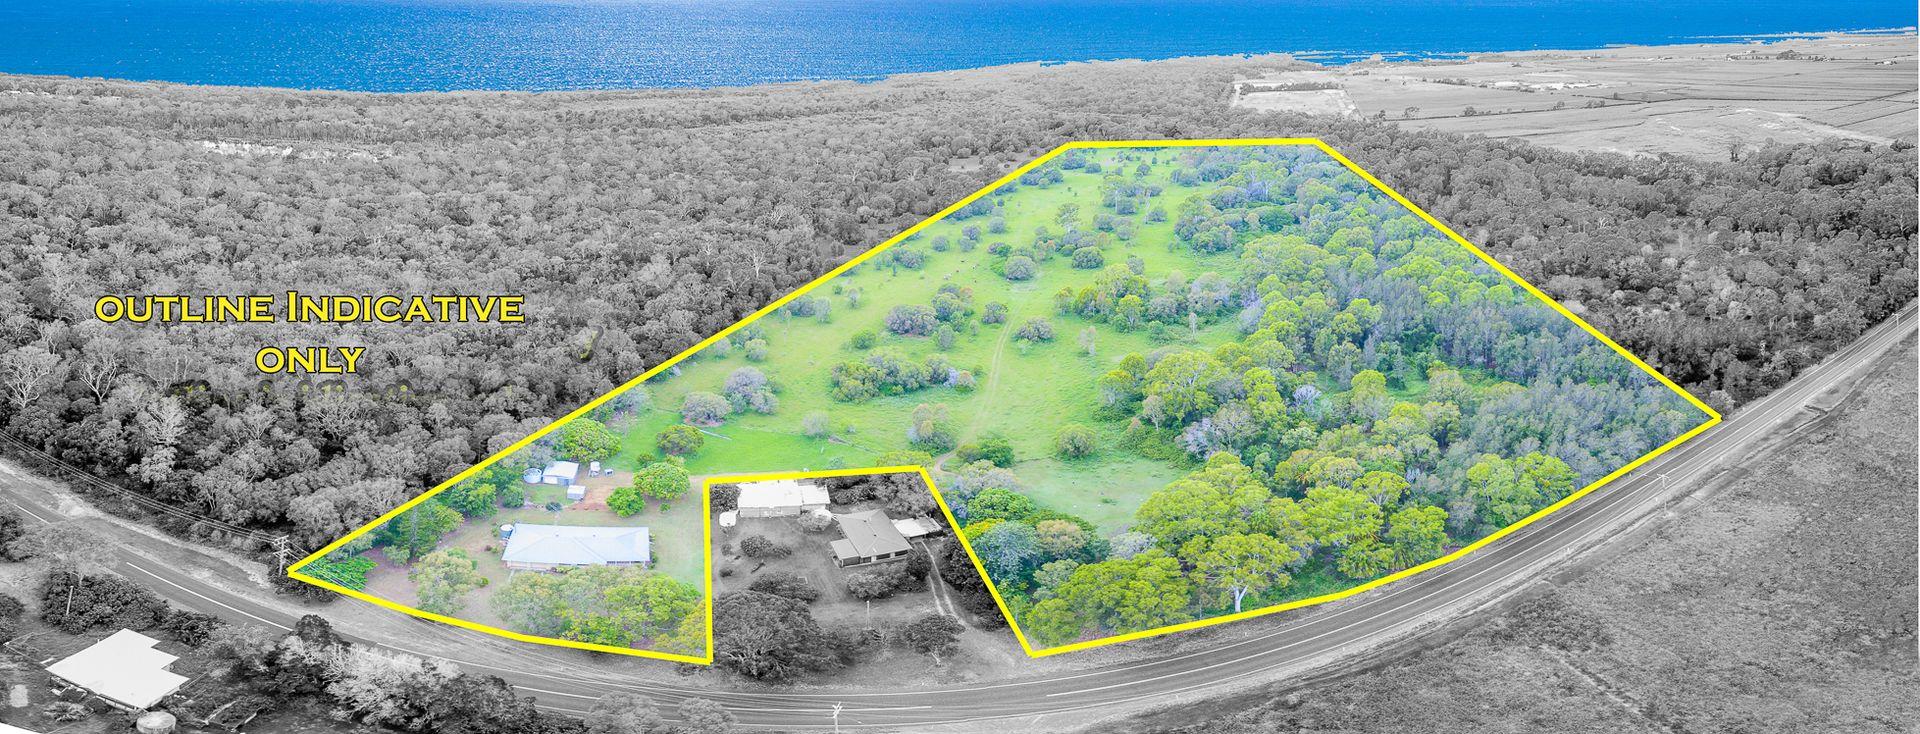 151 Moore Park Road, Moore Park Beach QLD 4670, Image 0